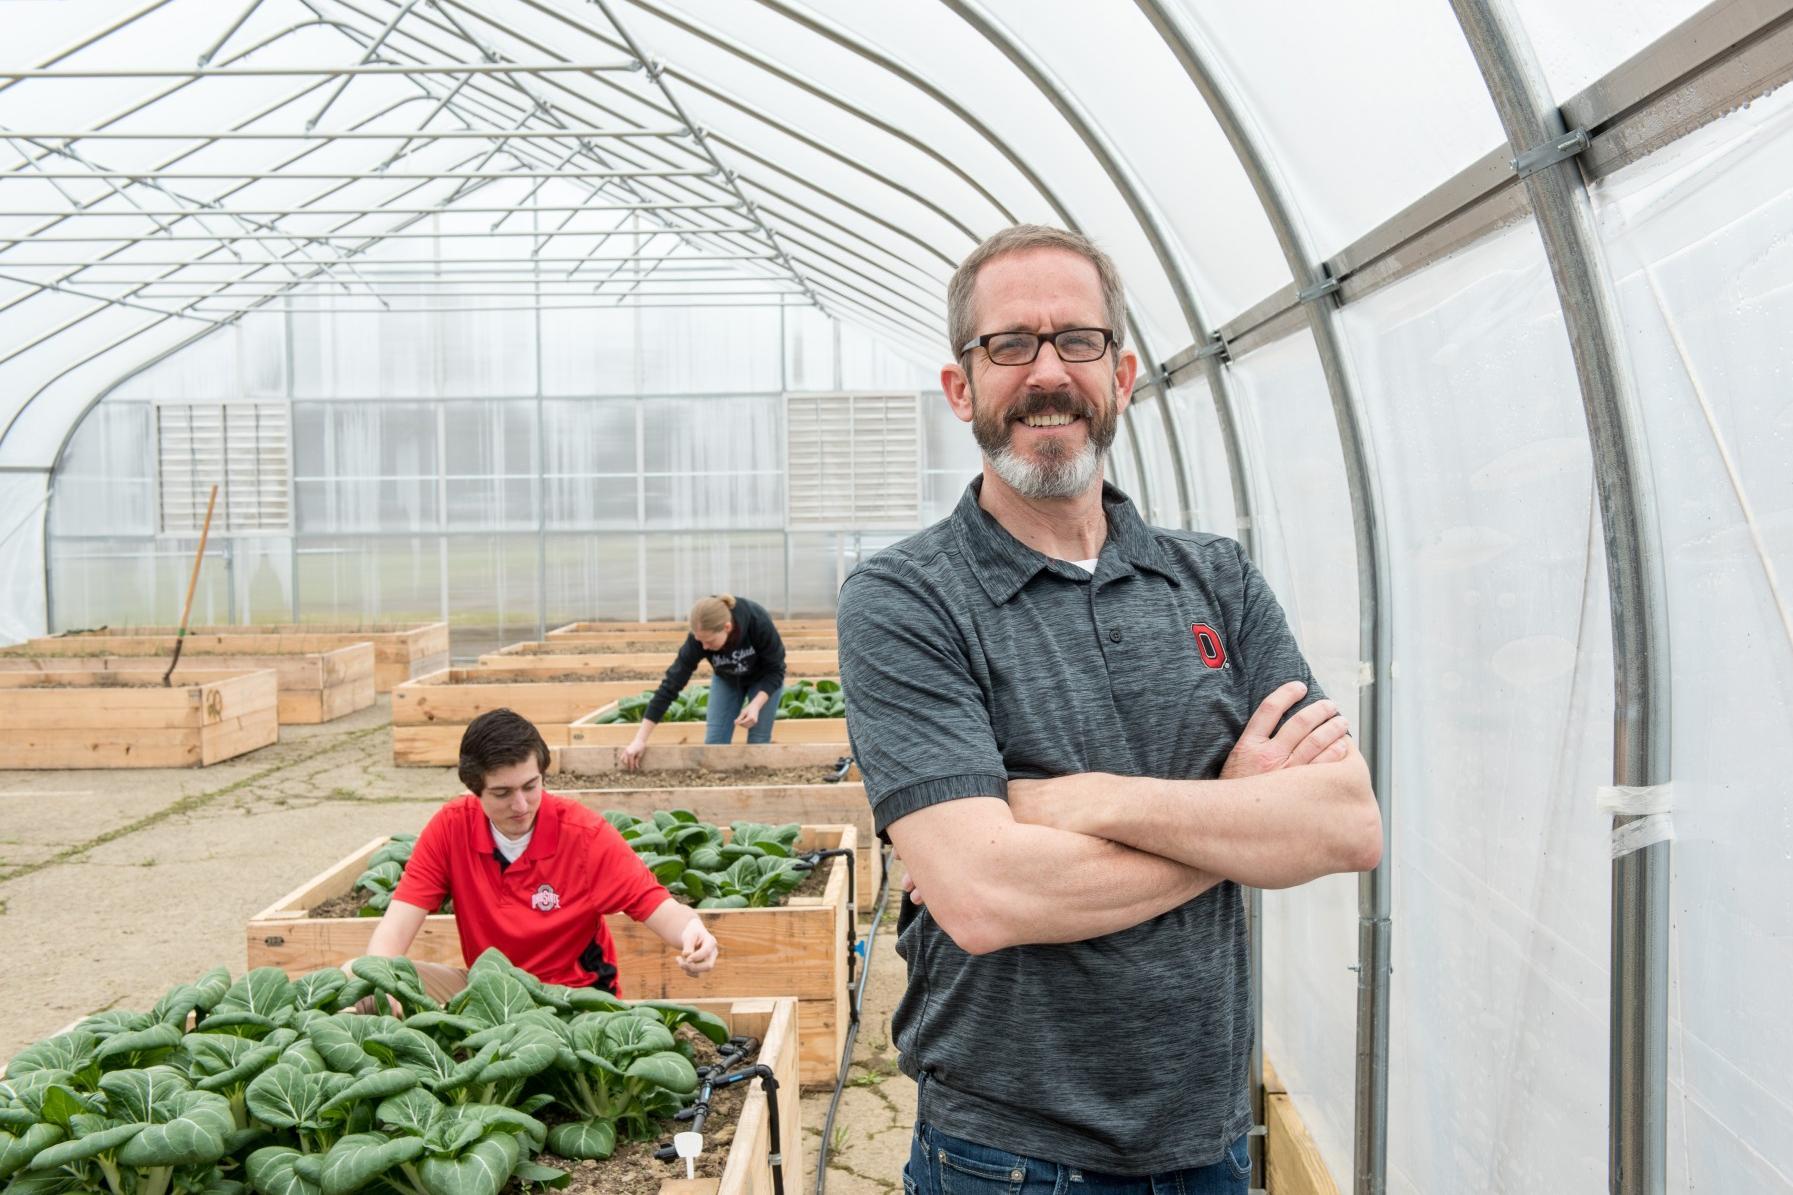 Professor Kip Curtis stands at the Mansfield Microfarm